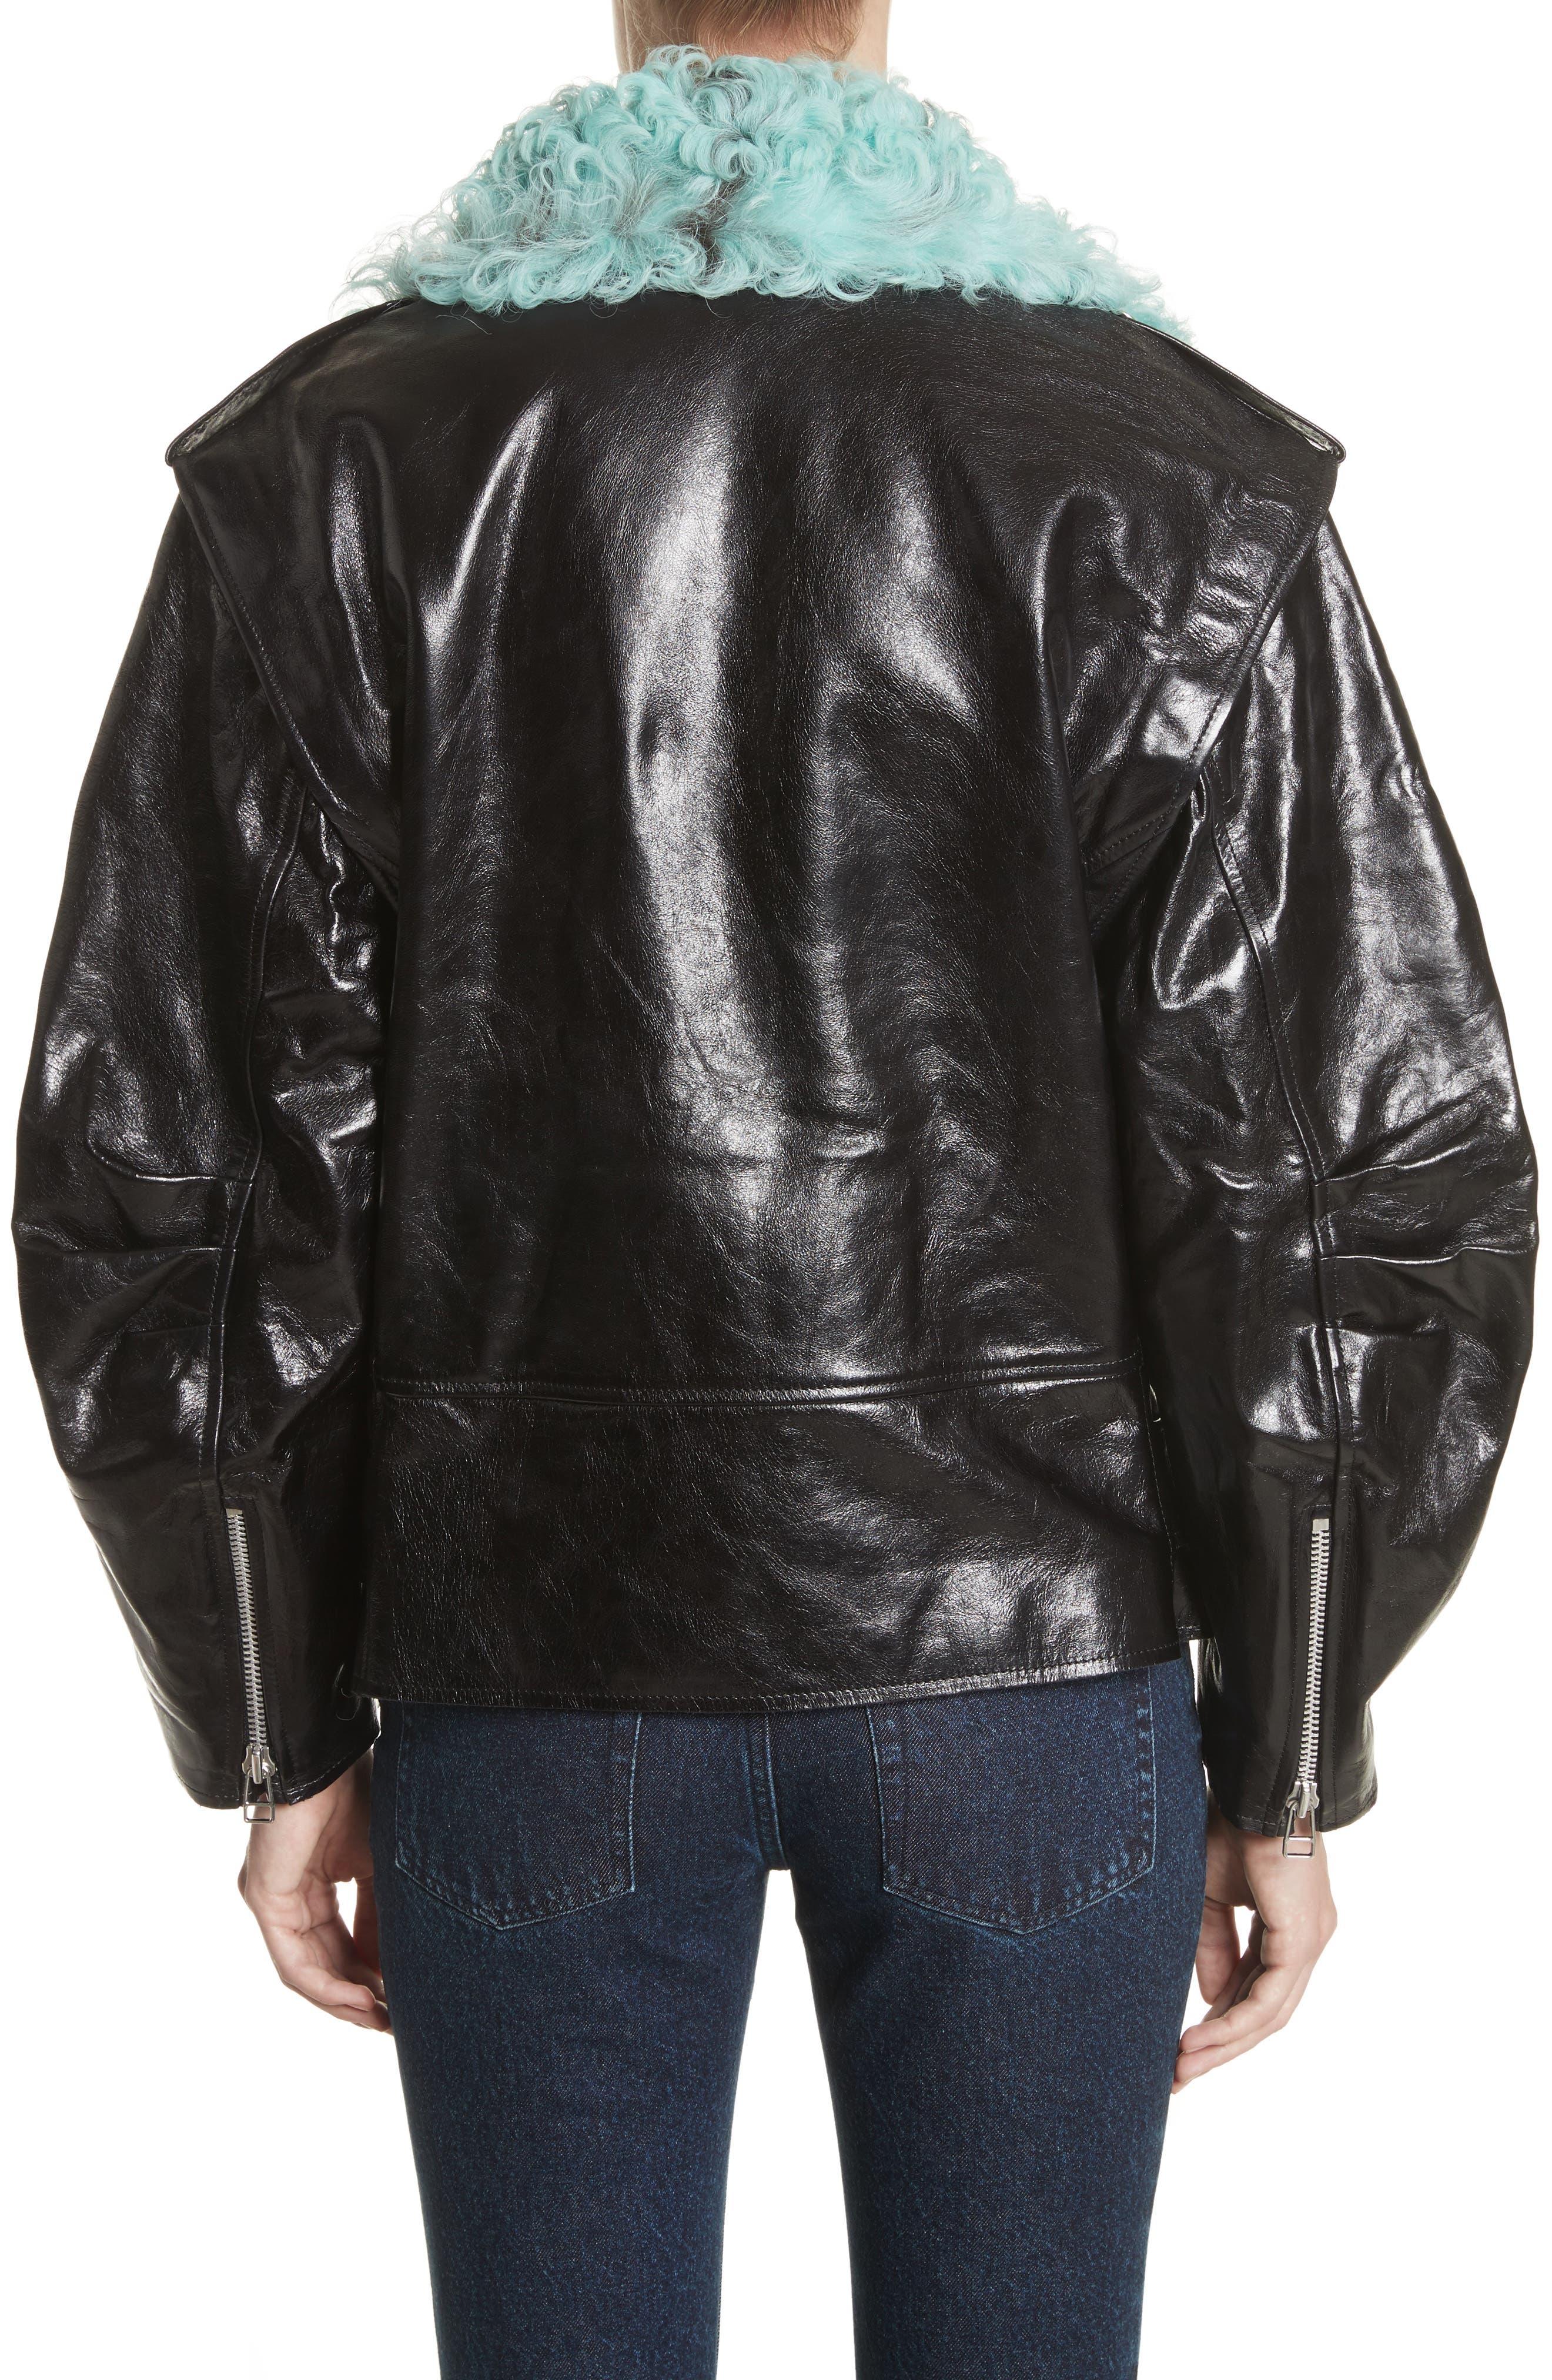 Marques'Almeida Detachable Sleeve Biker Jacket with Genuine Shearling Trim,                             Alternate thumbnail 2, color,                             003